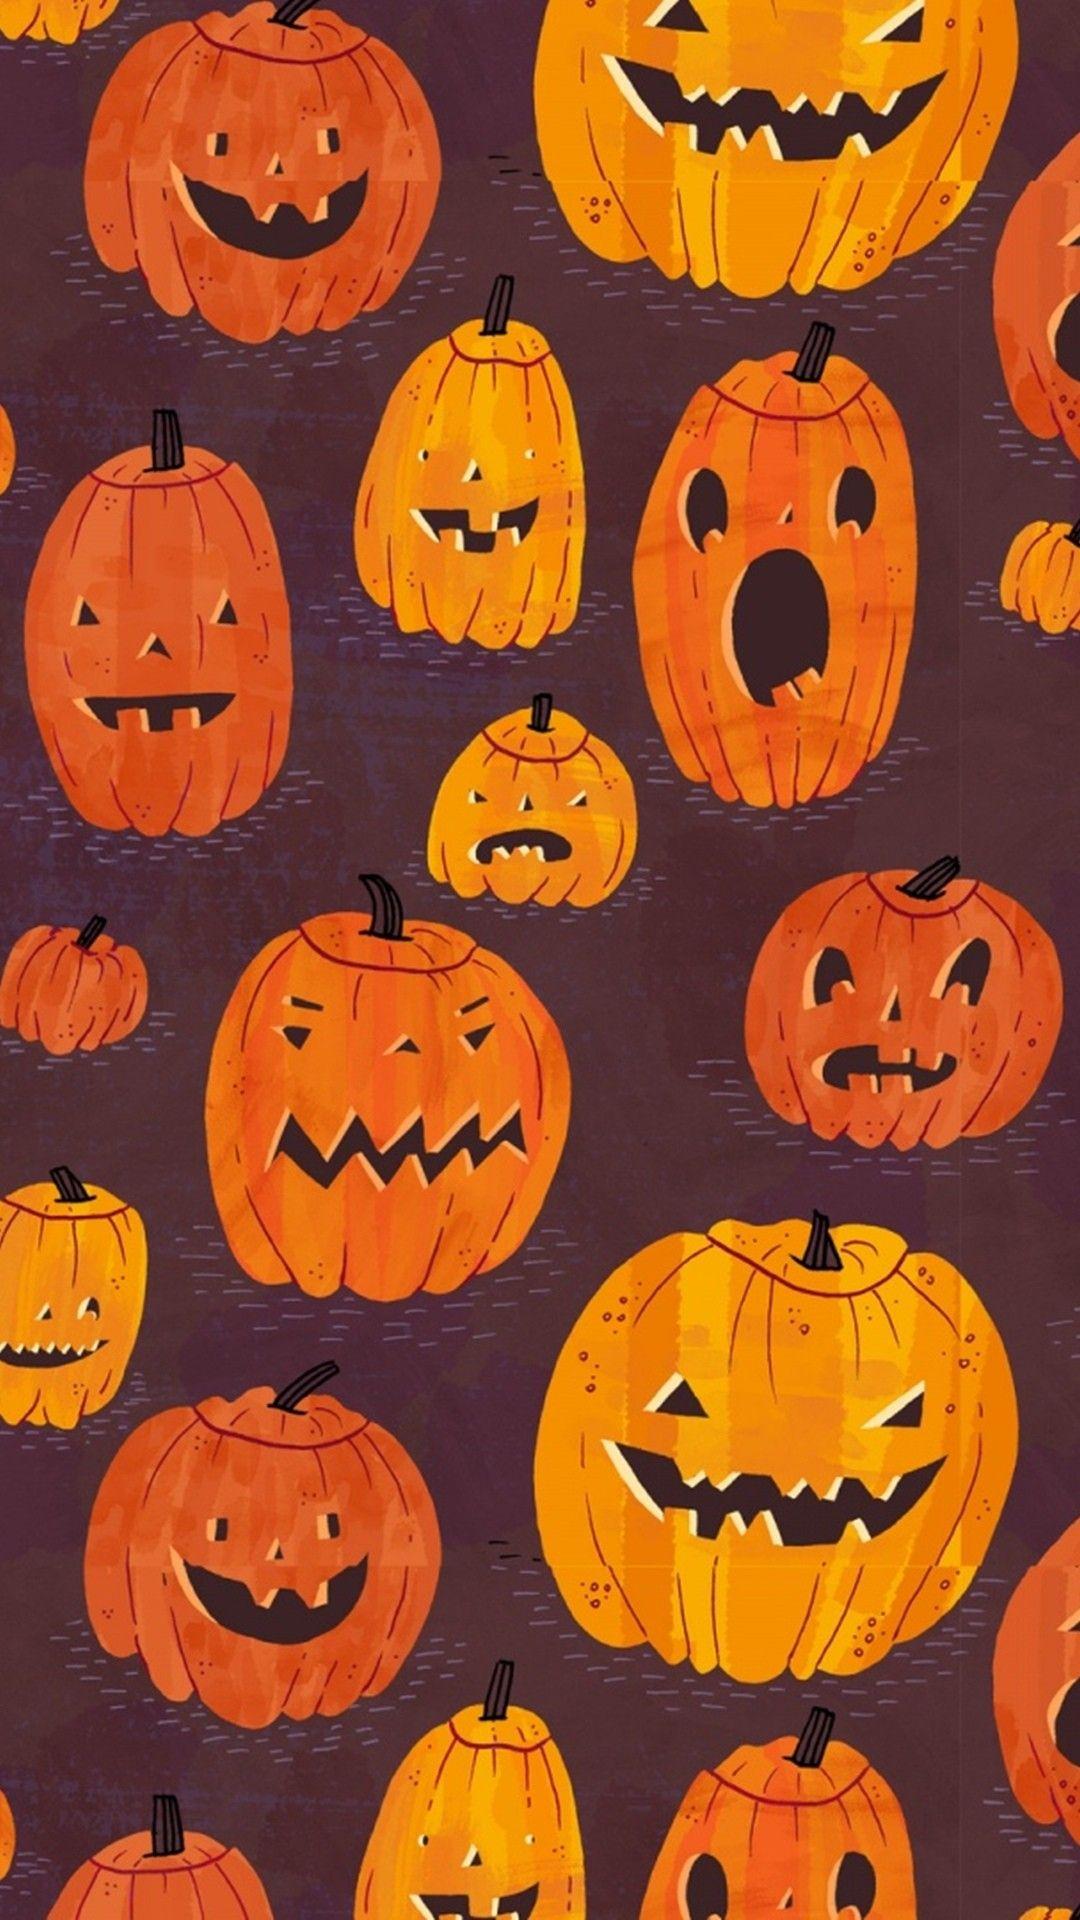 Iphone Halloween Wallpaper Pumpkin wallpaper, Halloween